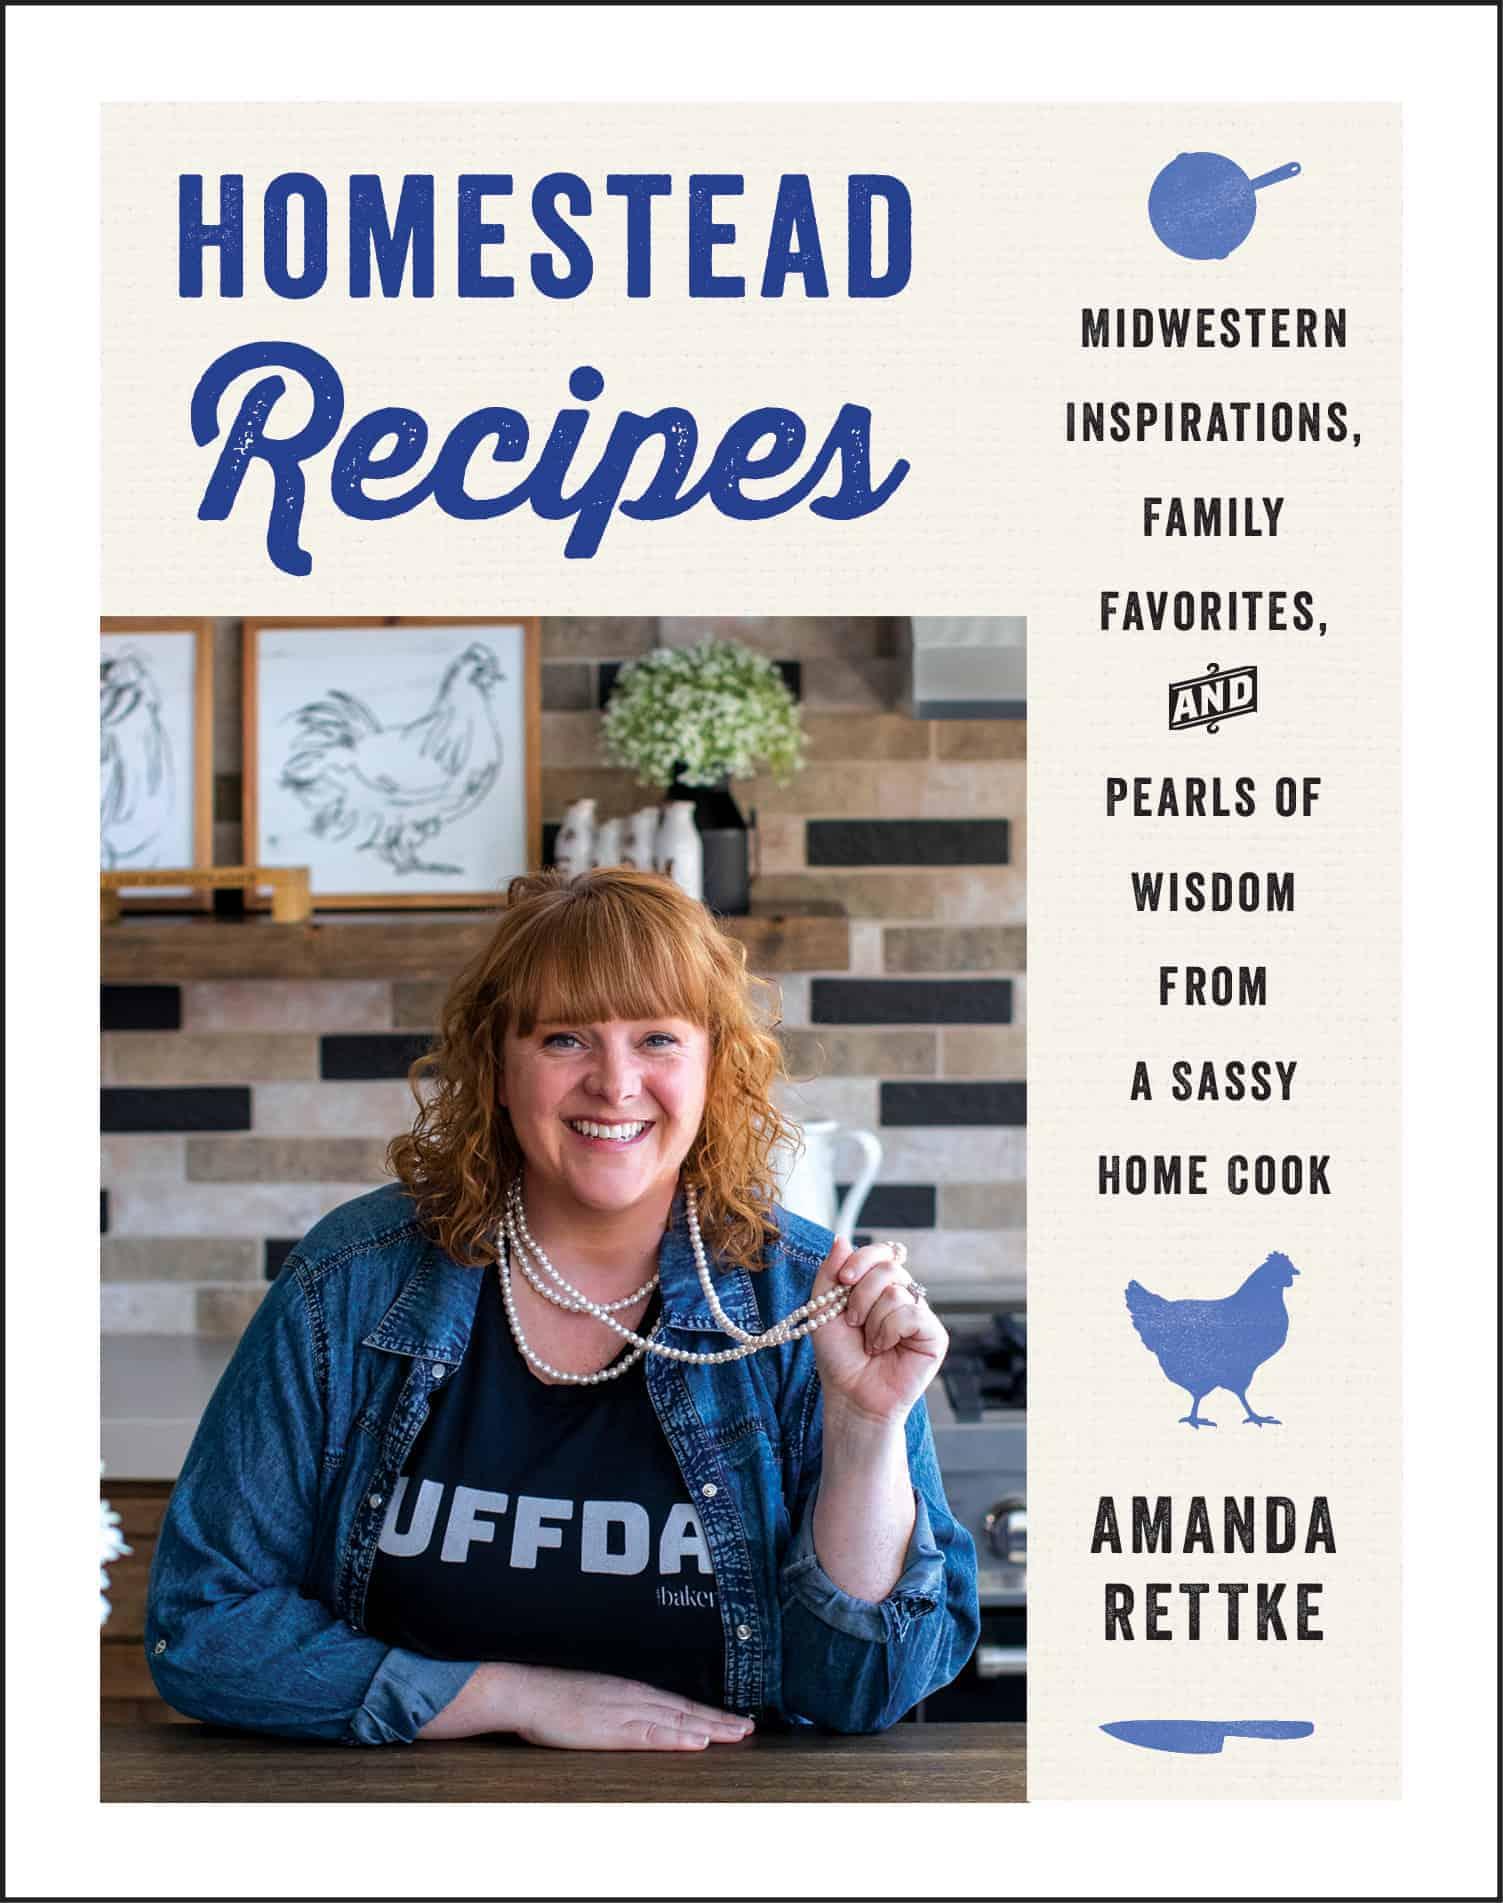 Homestead Recipes Book Cover